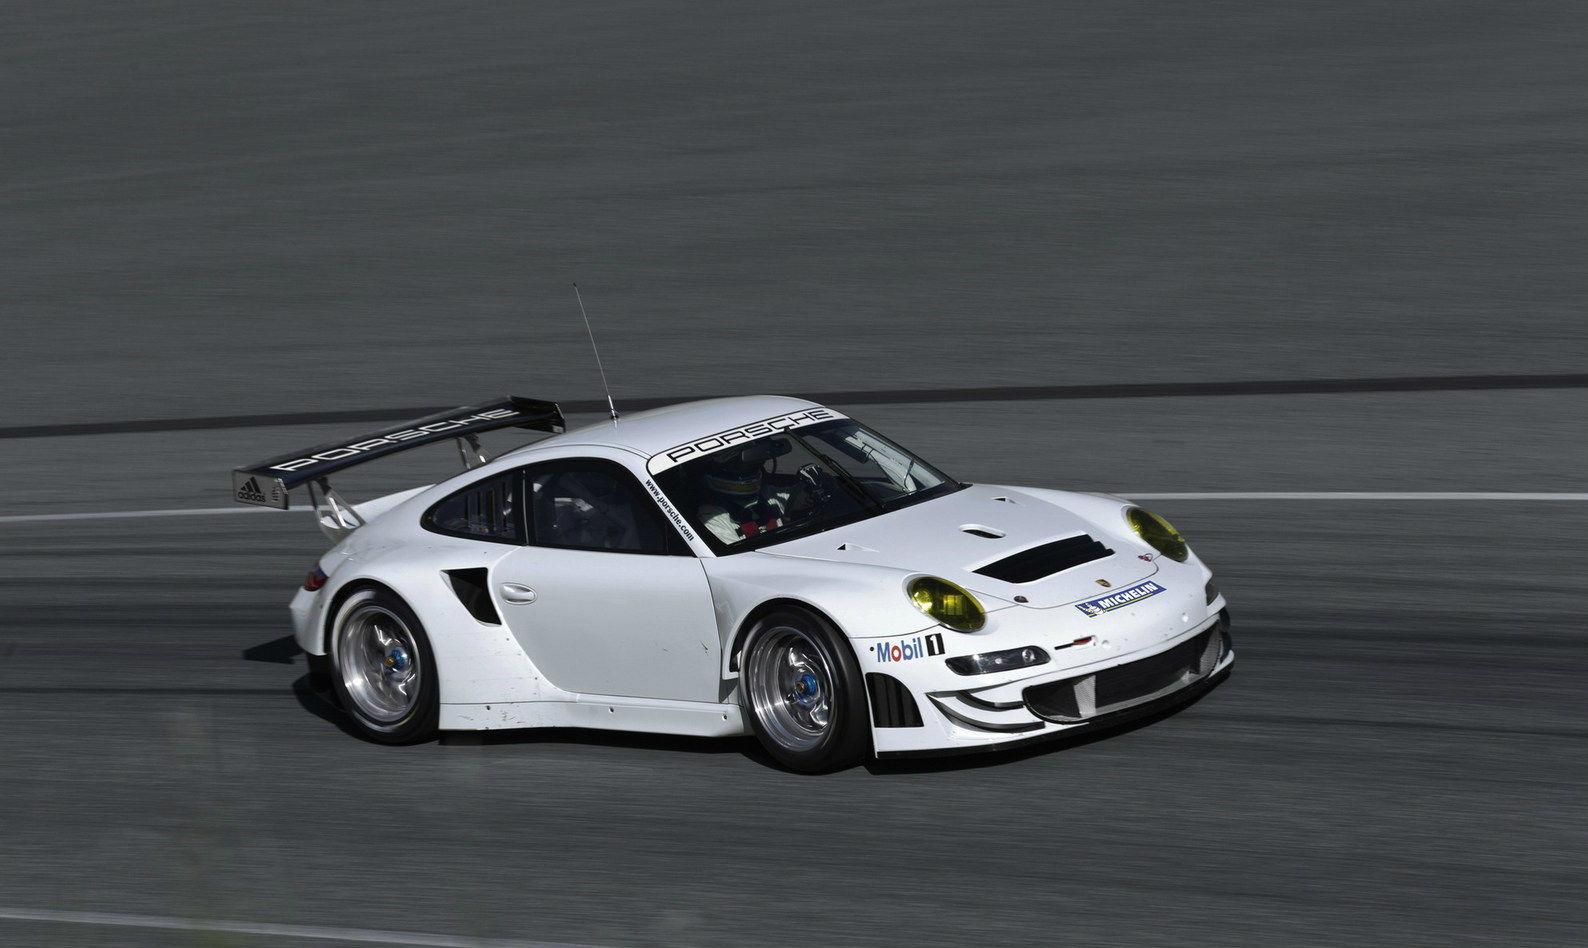 2012 Porsche 911 GT3 RSR for Porsche motorsport